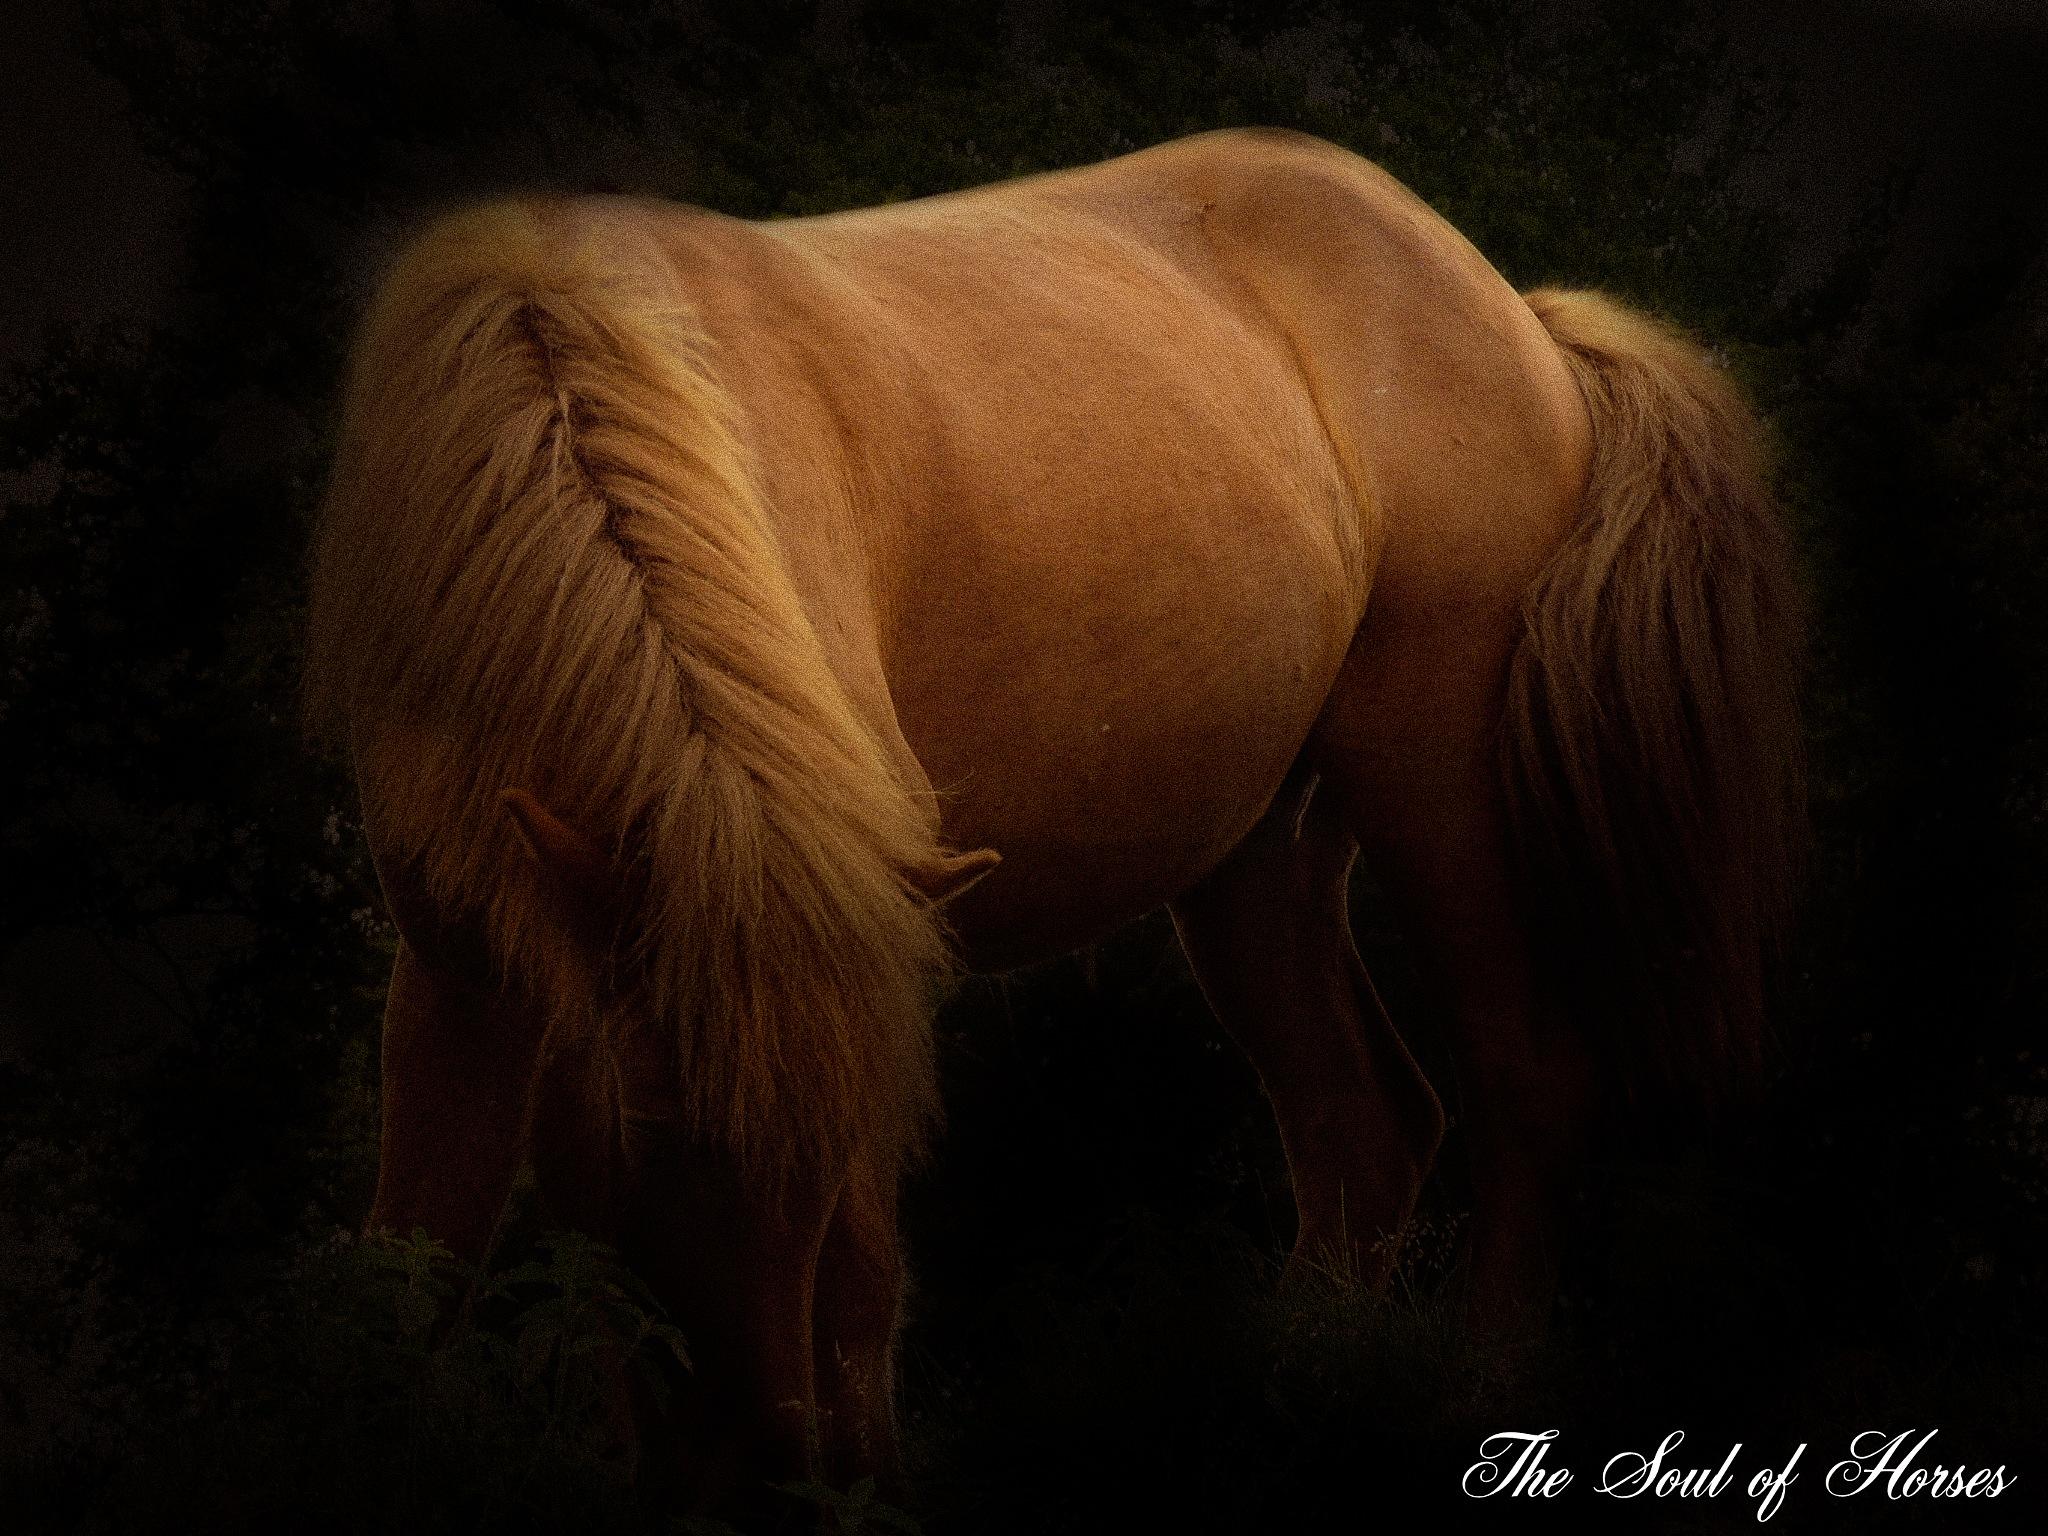 The beauty in its simplest form. by Freddy Juhl